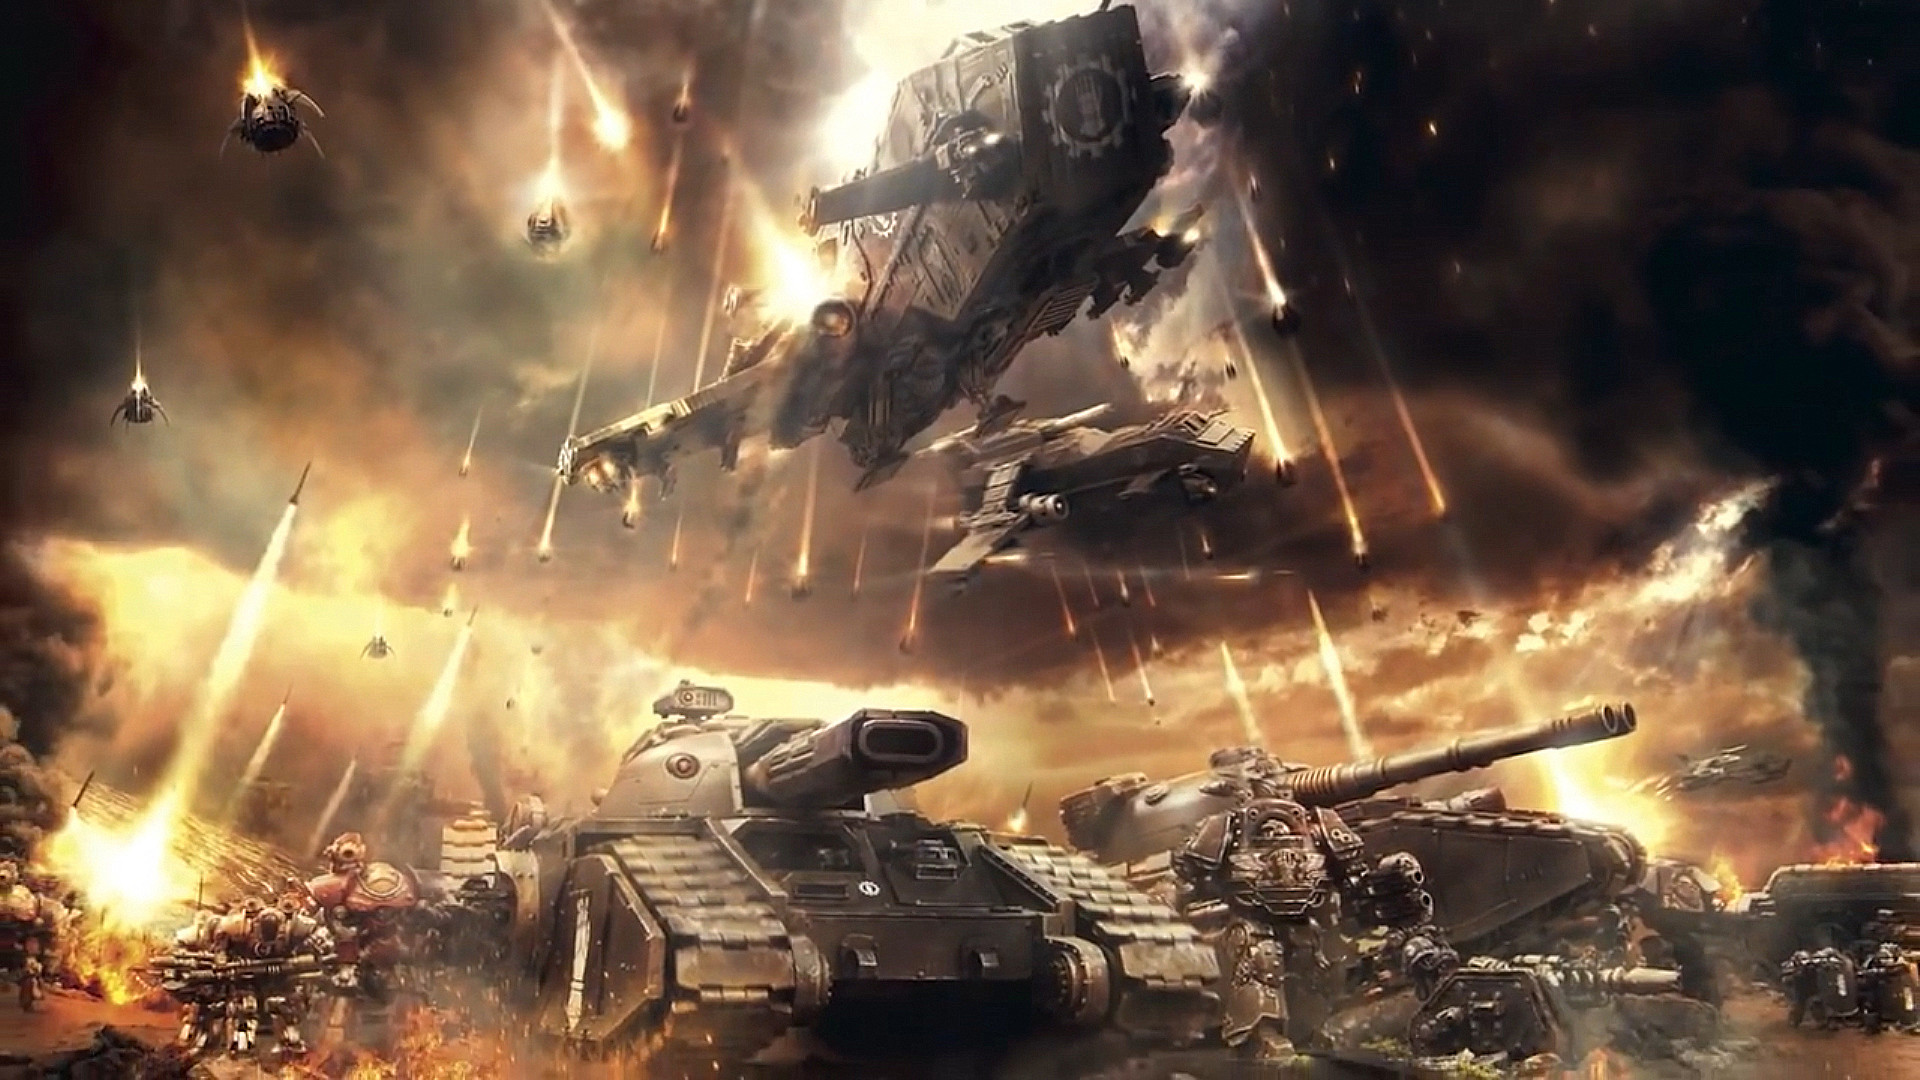 40K Battle of Istvaan III – Google Search